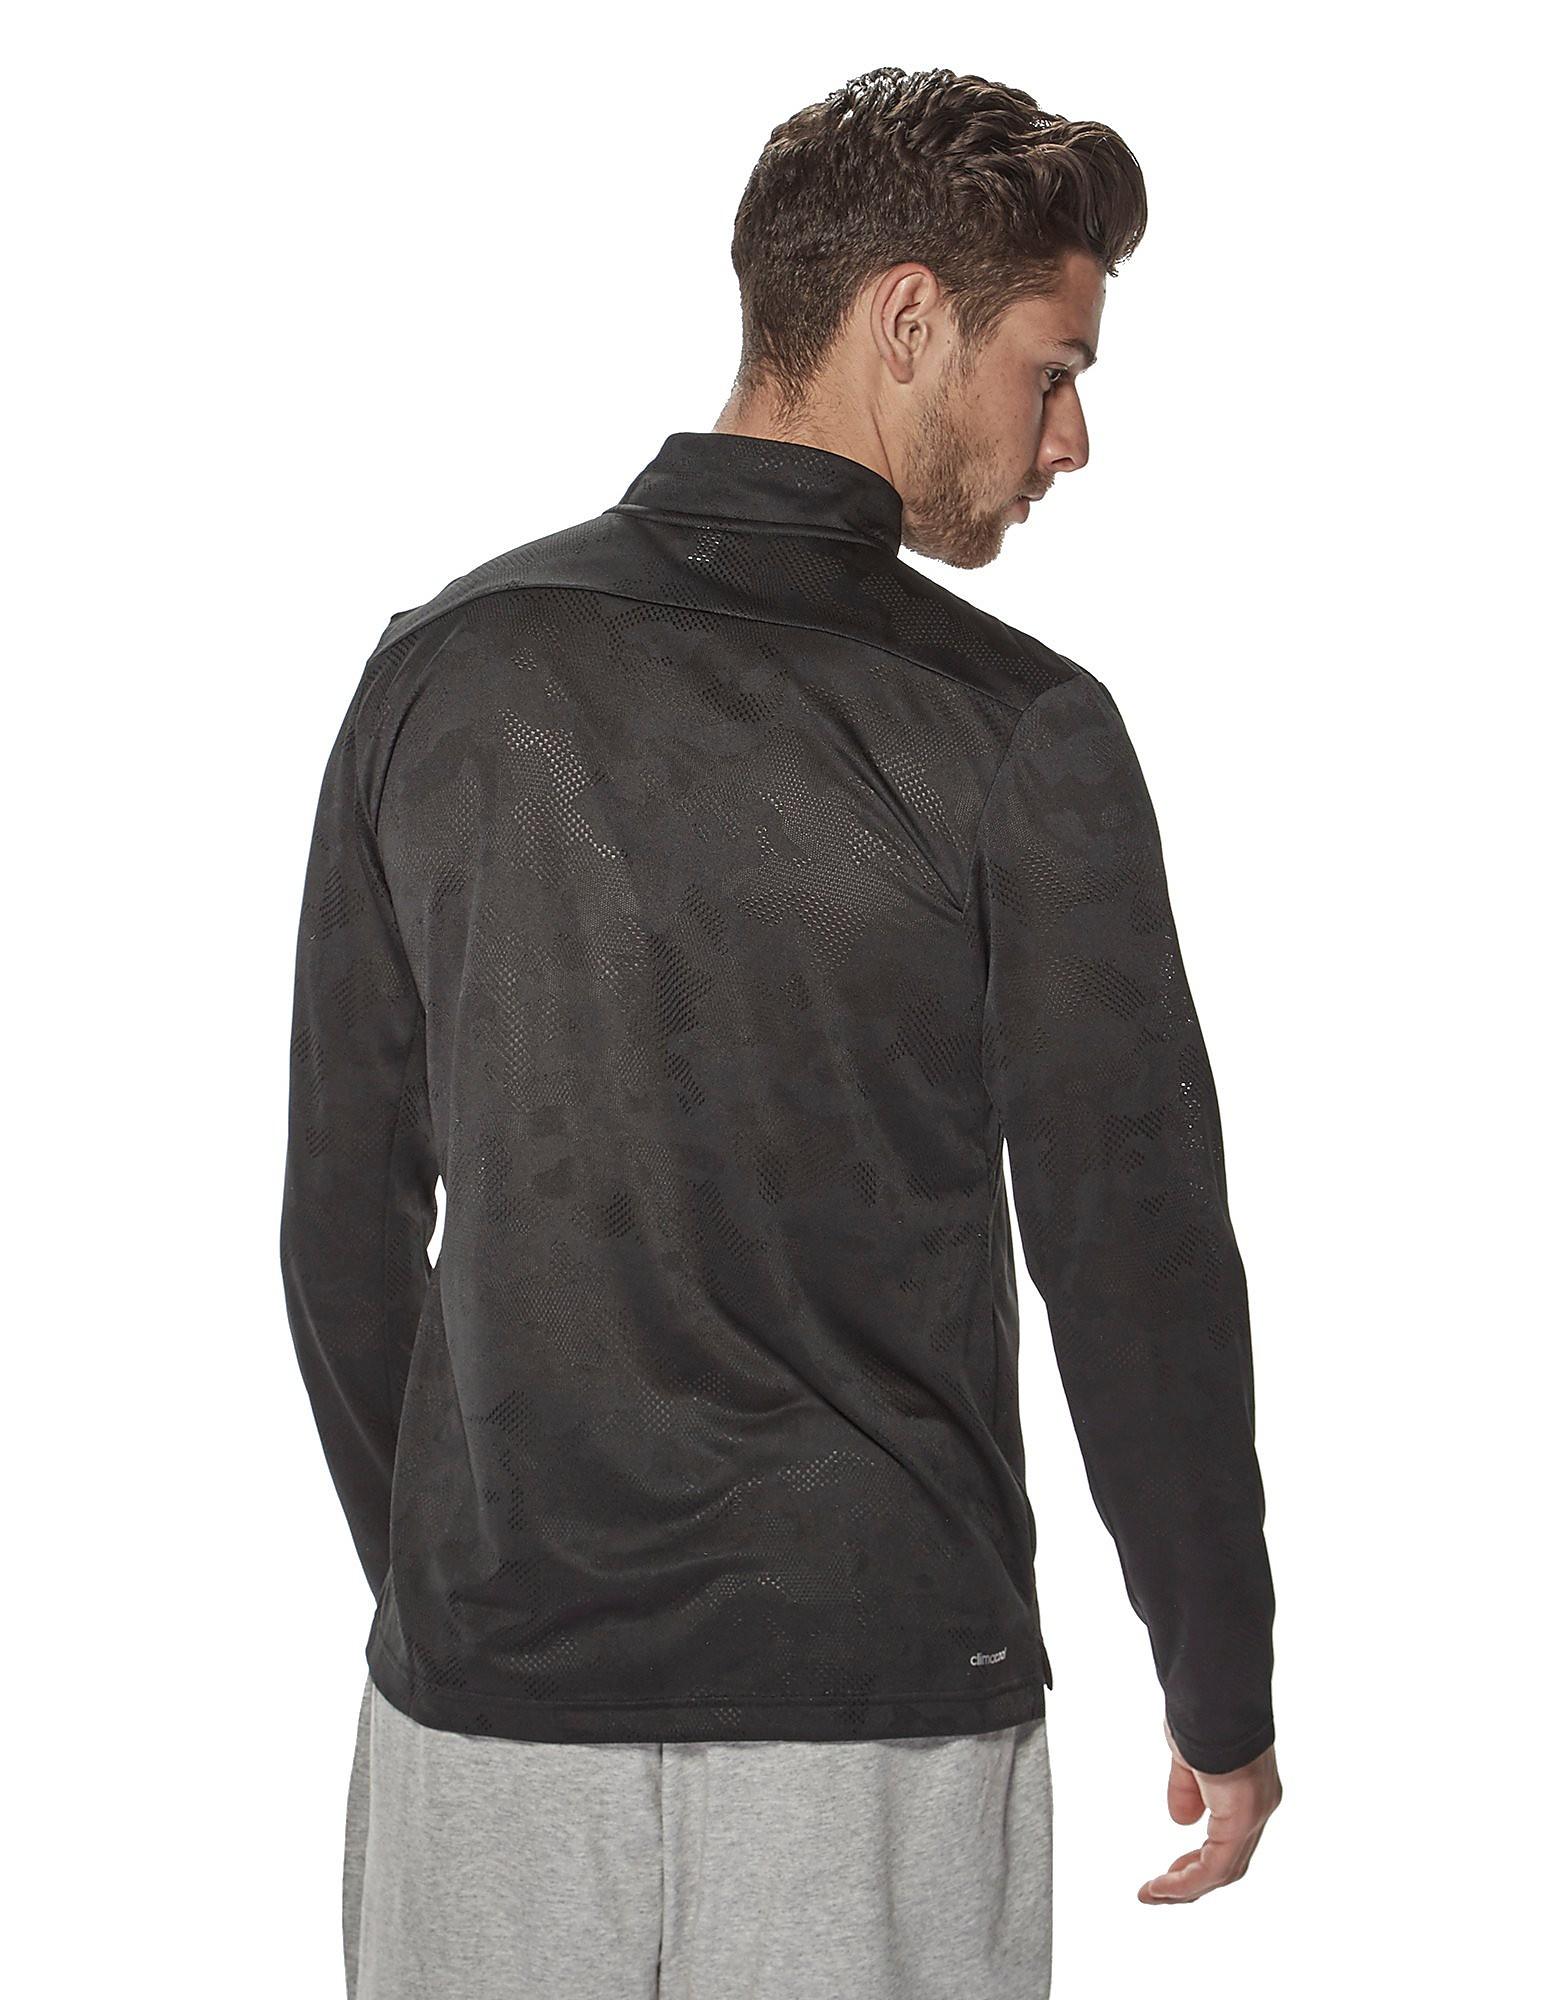 adidas Workout Long-Sleeved T-Shirt